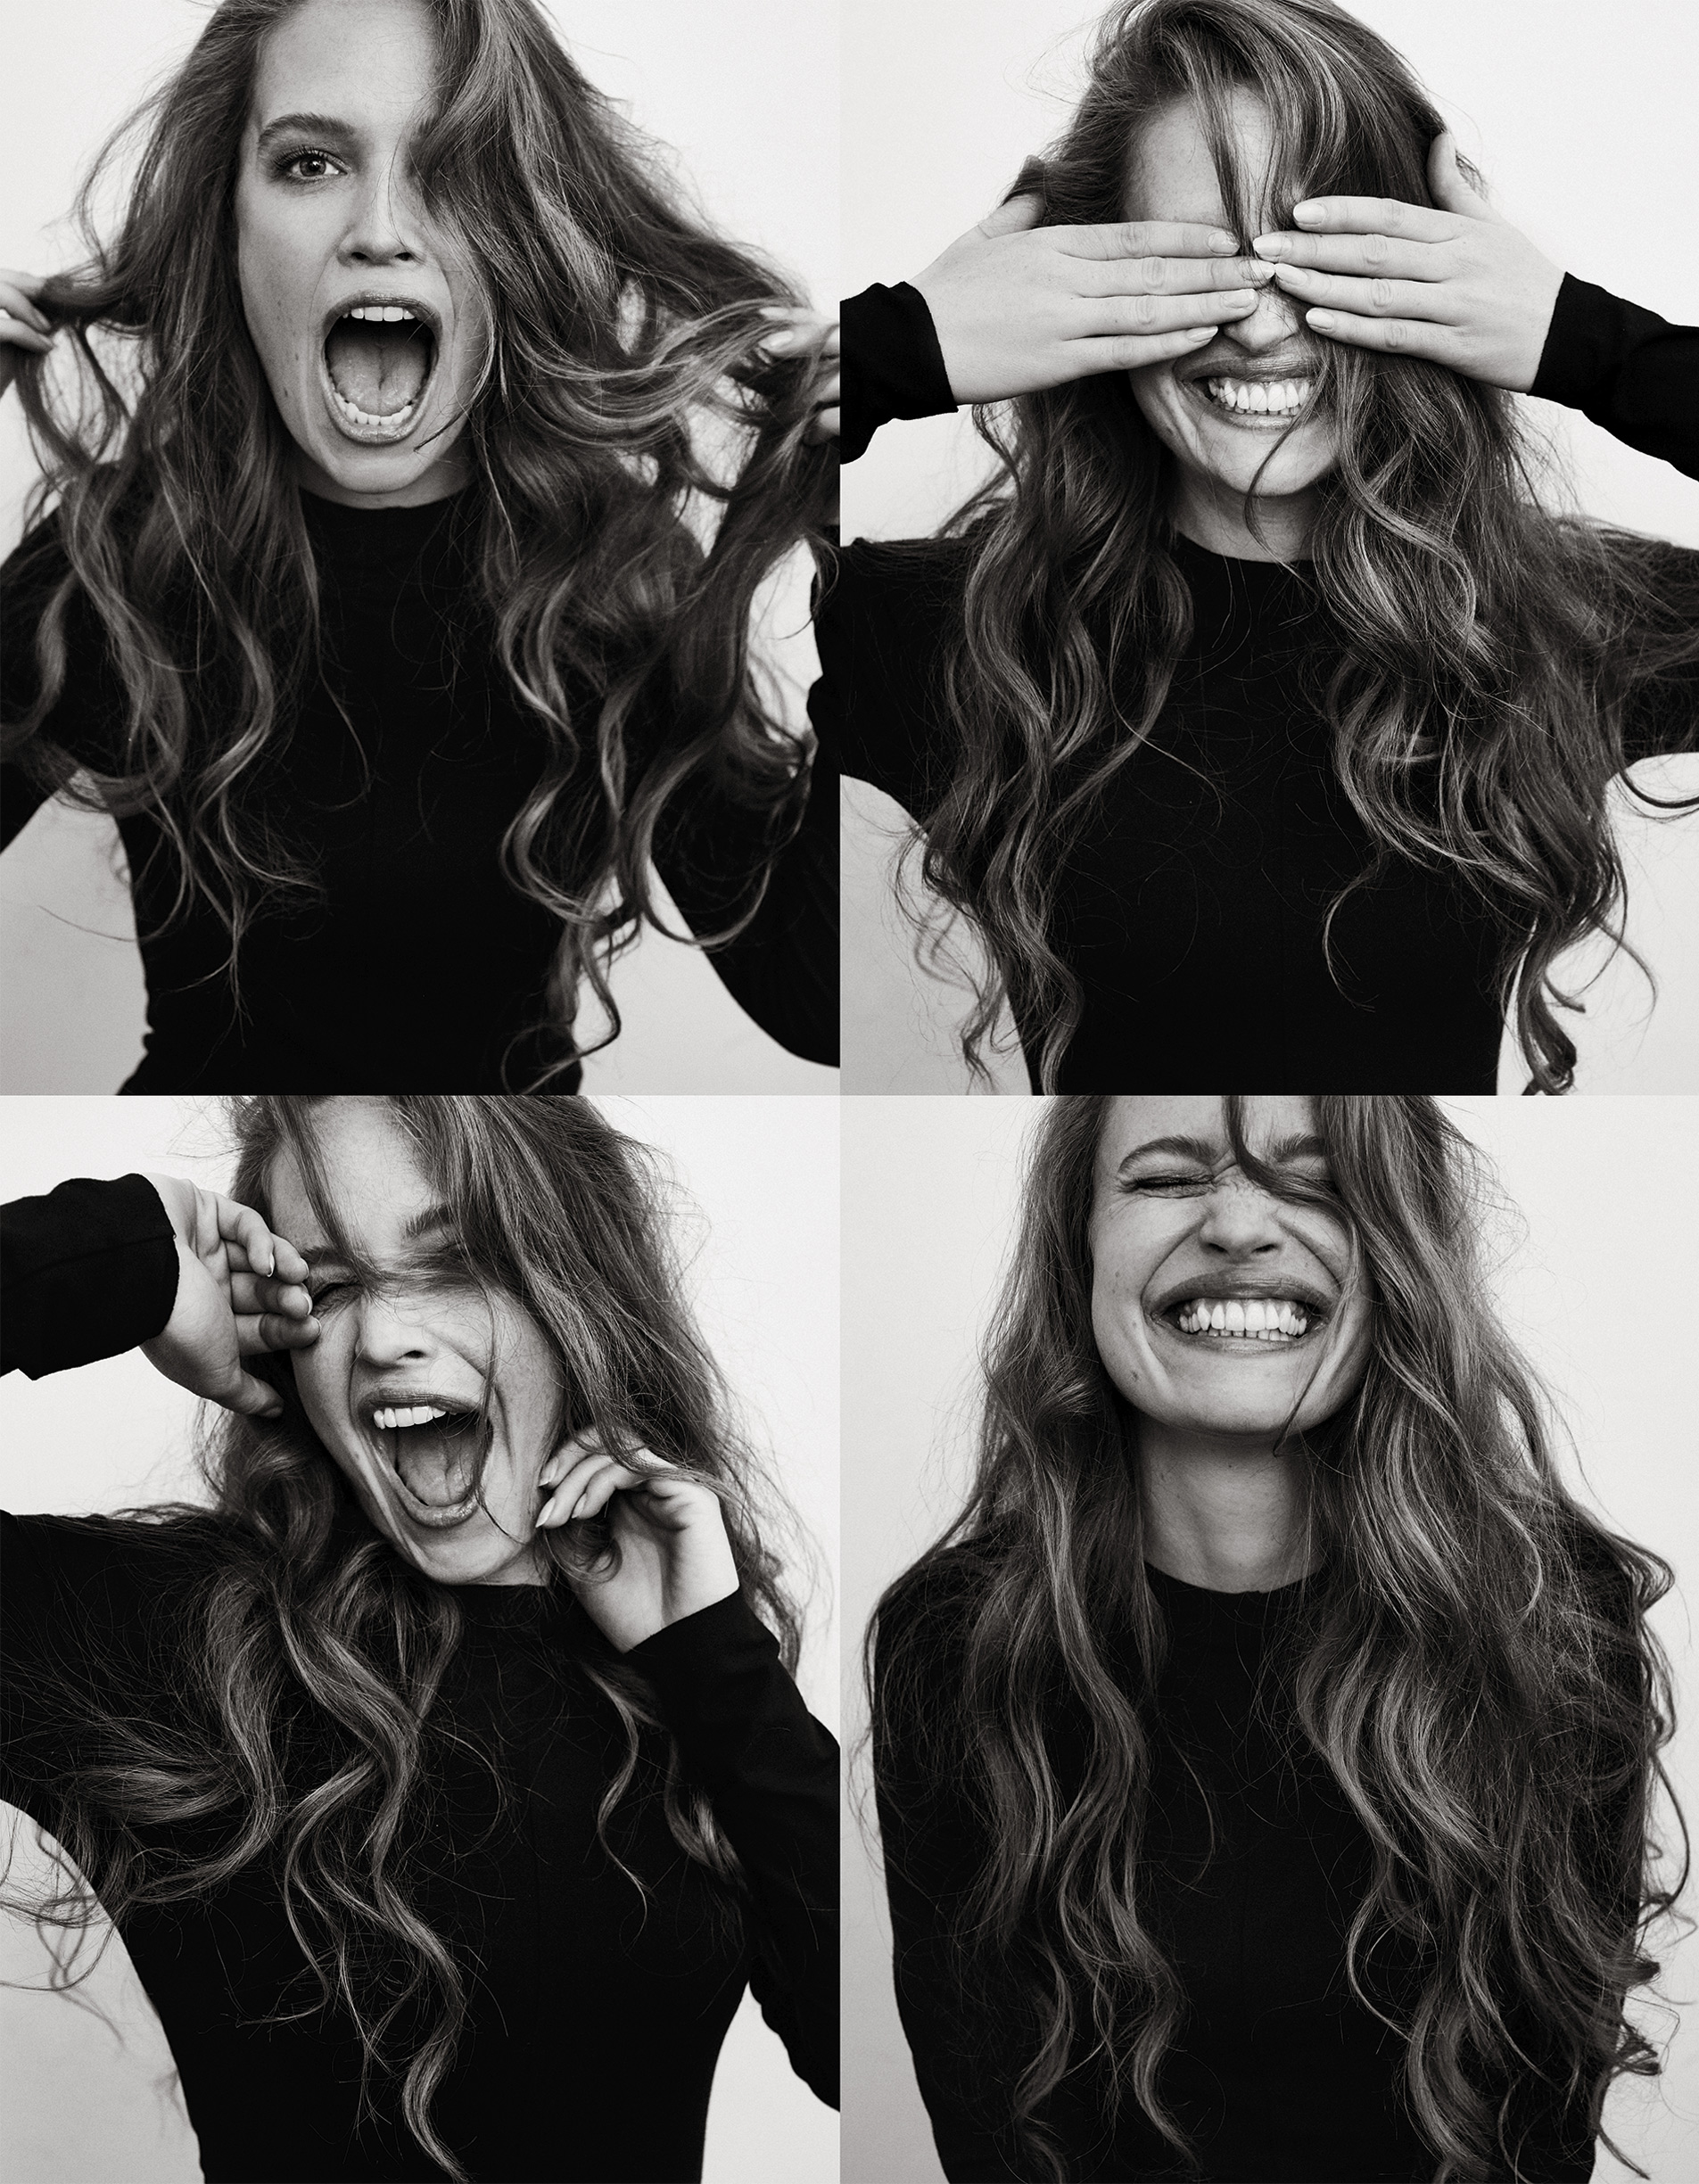 Rethink_Hairshop_Photobooth.jpg